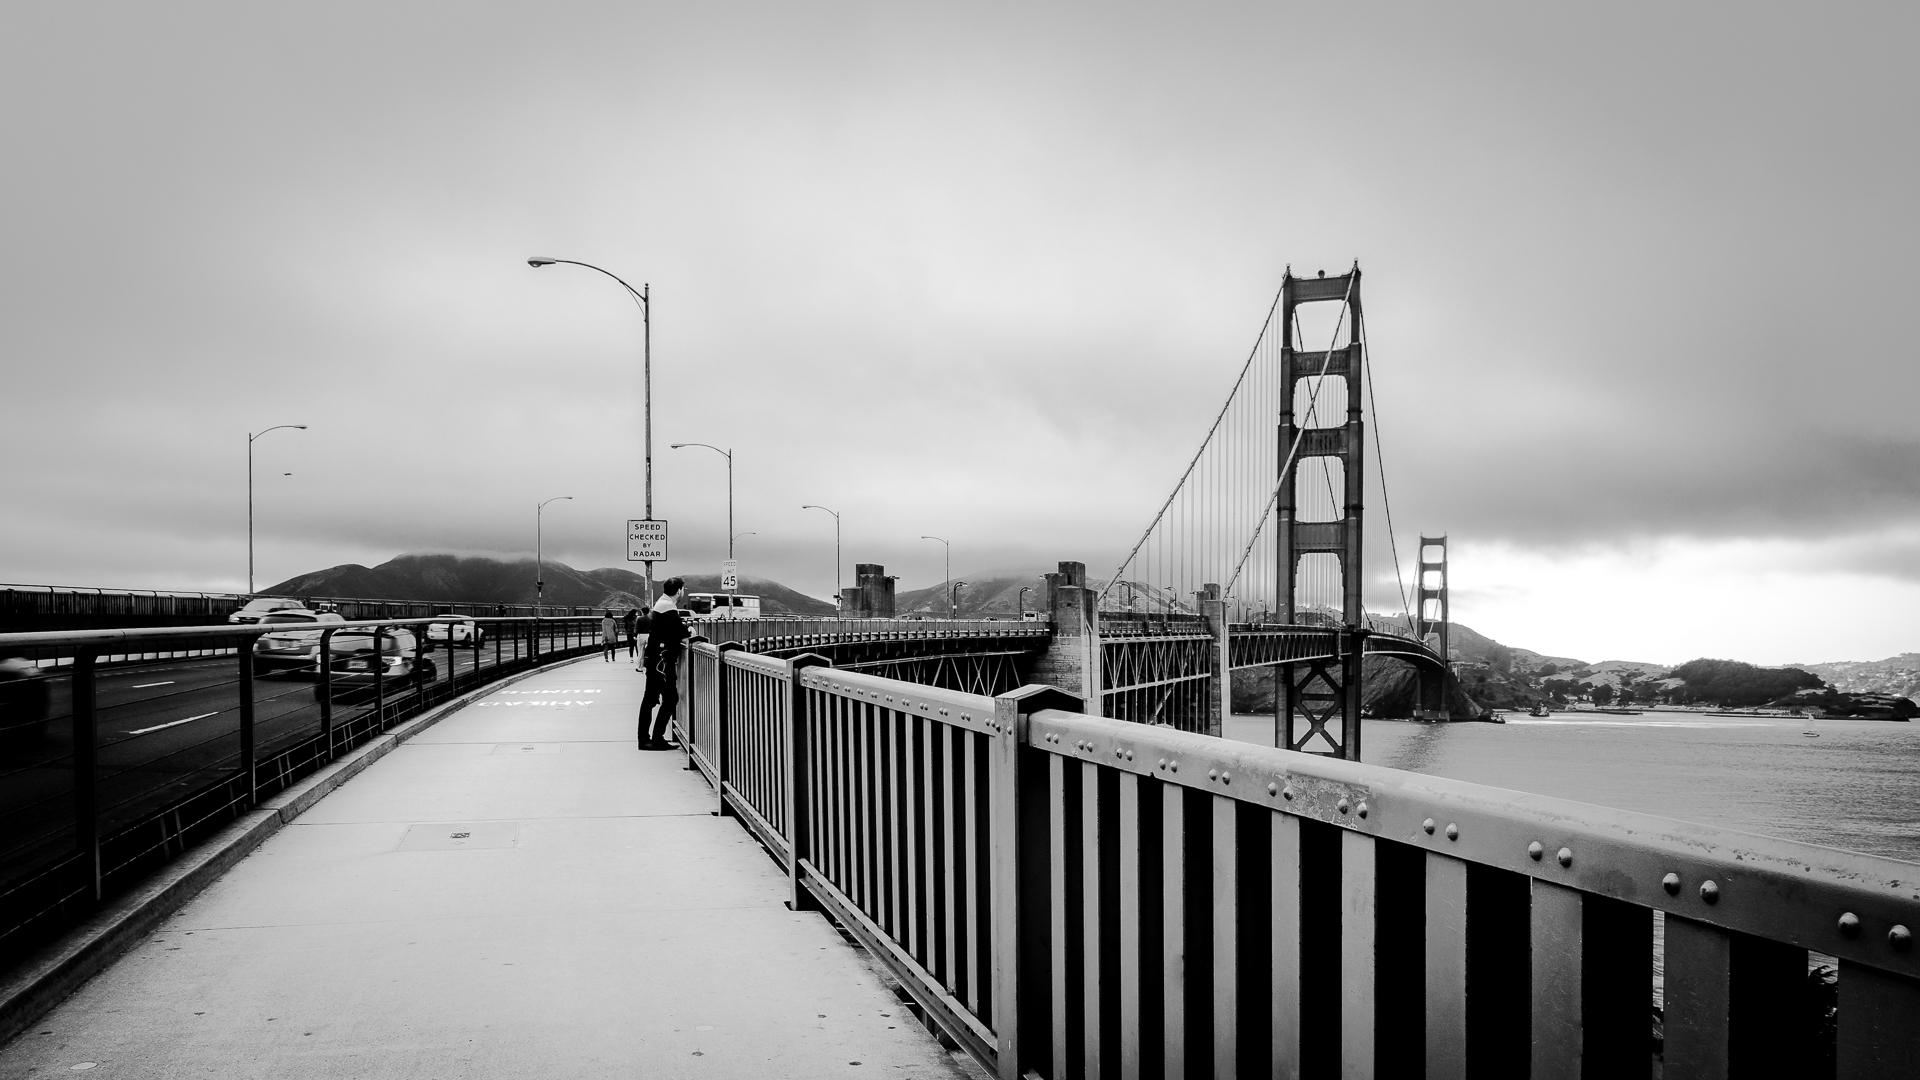 Walking on the bridge...